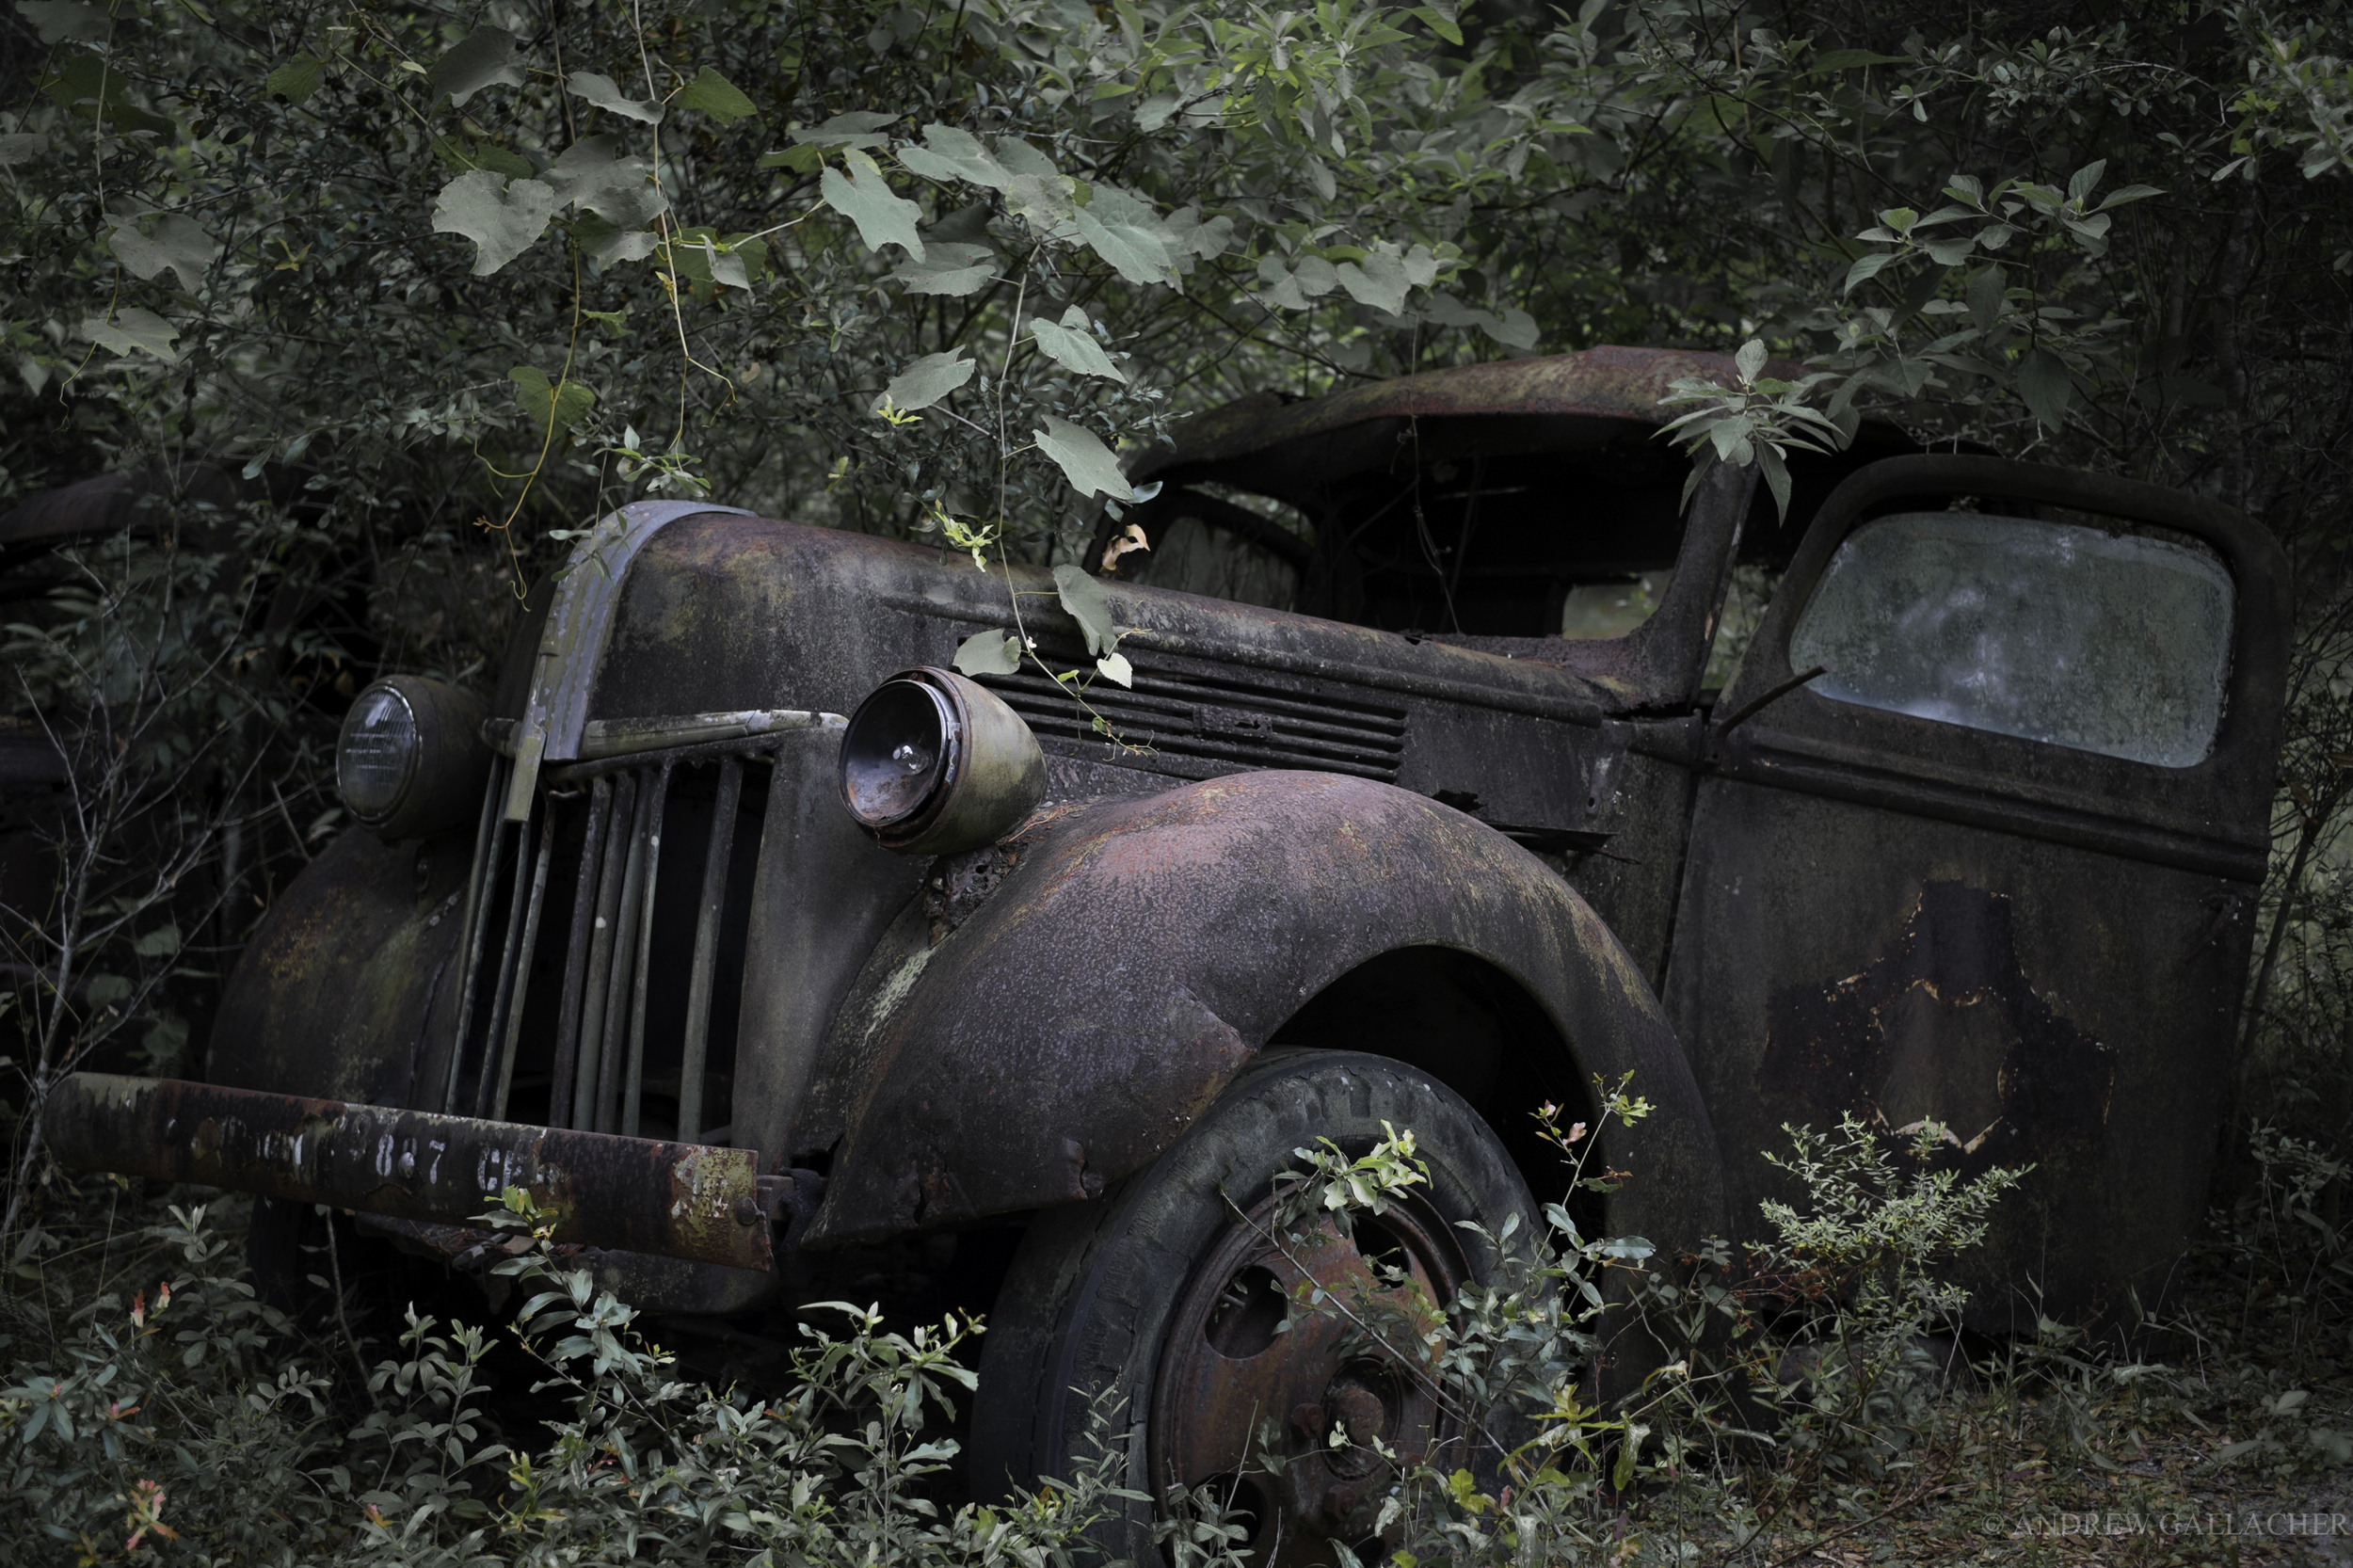 Army truck, Florida